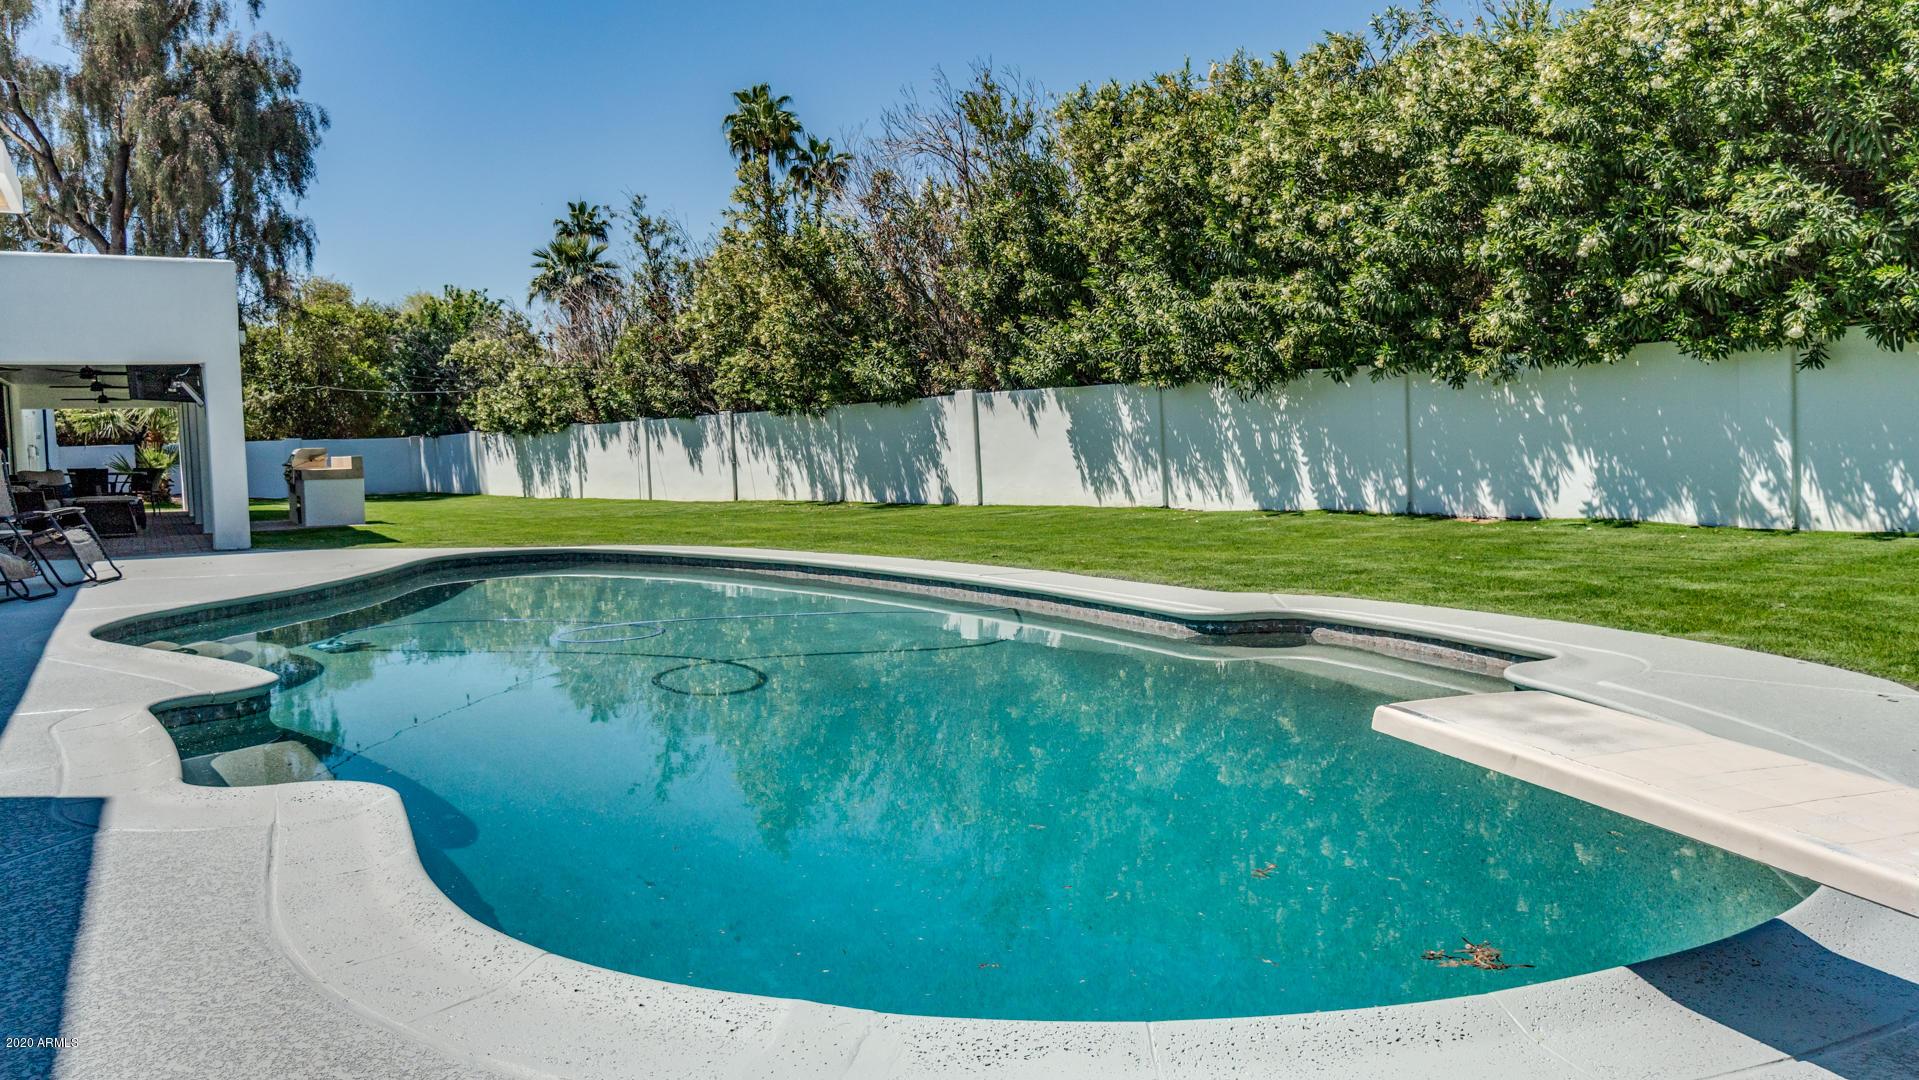 MLS 6069801 3920 N 54TH Street, Phoenix, AZ 85018 Phoenix AZ Private Pool